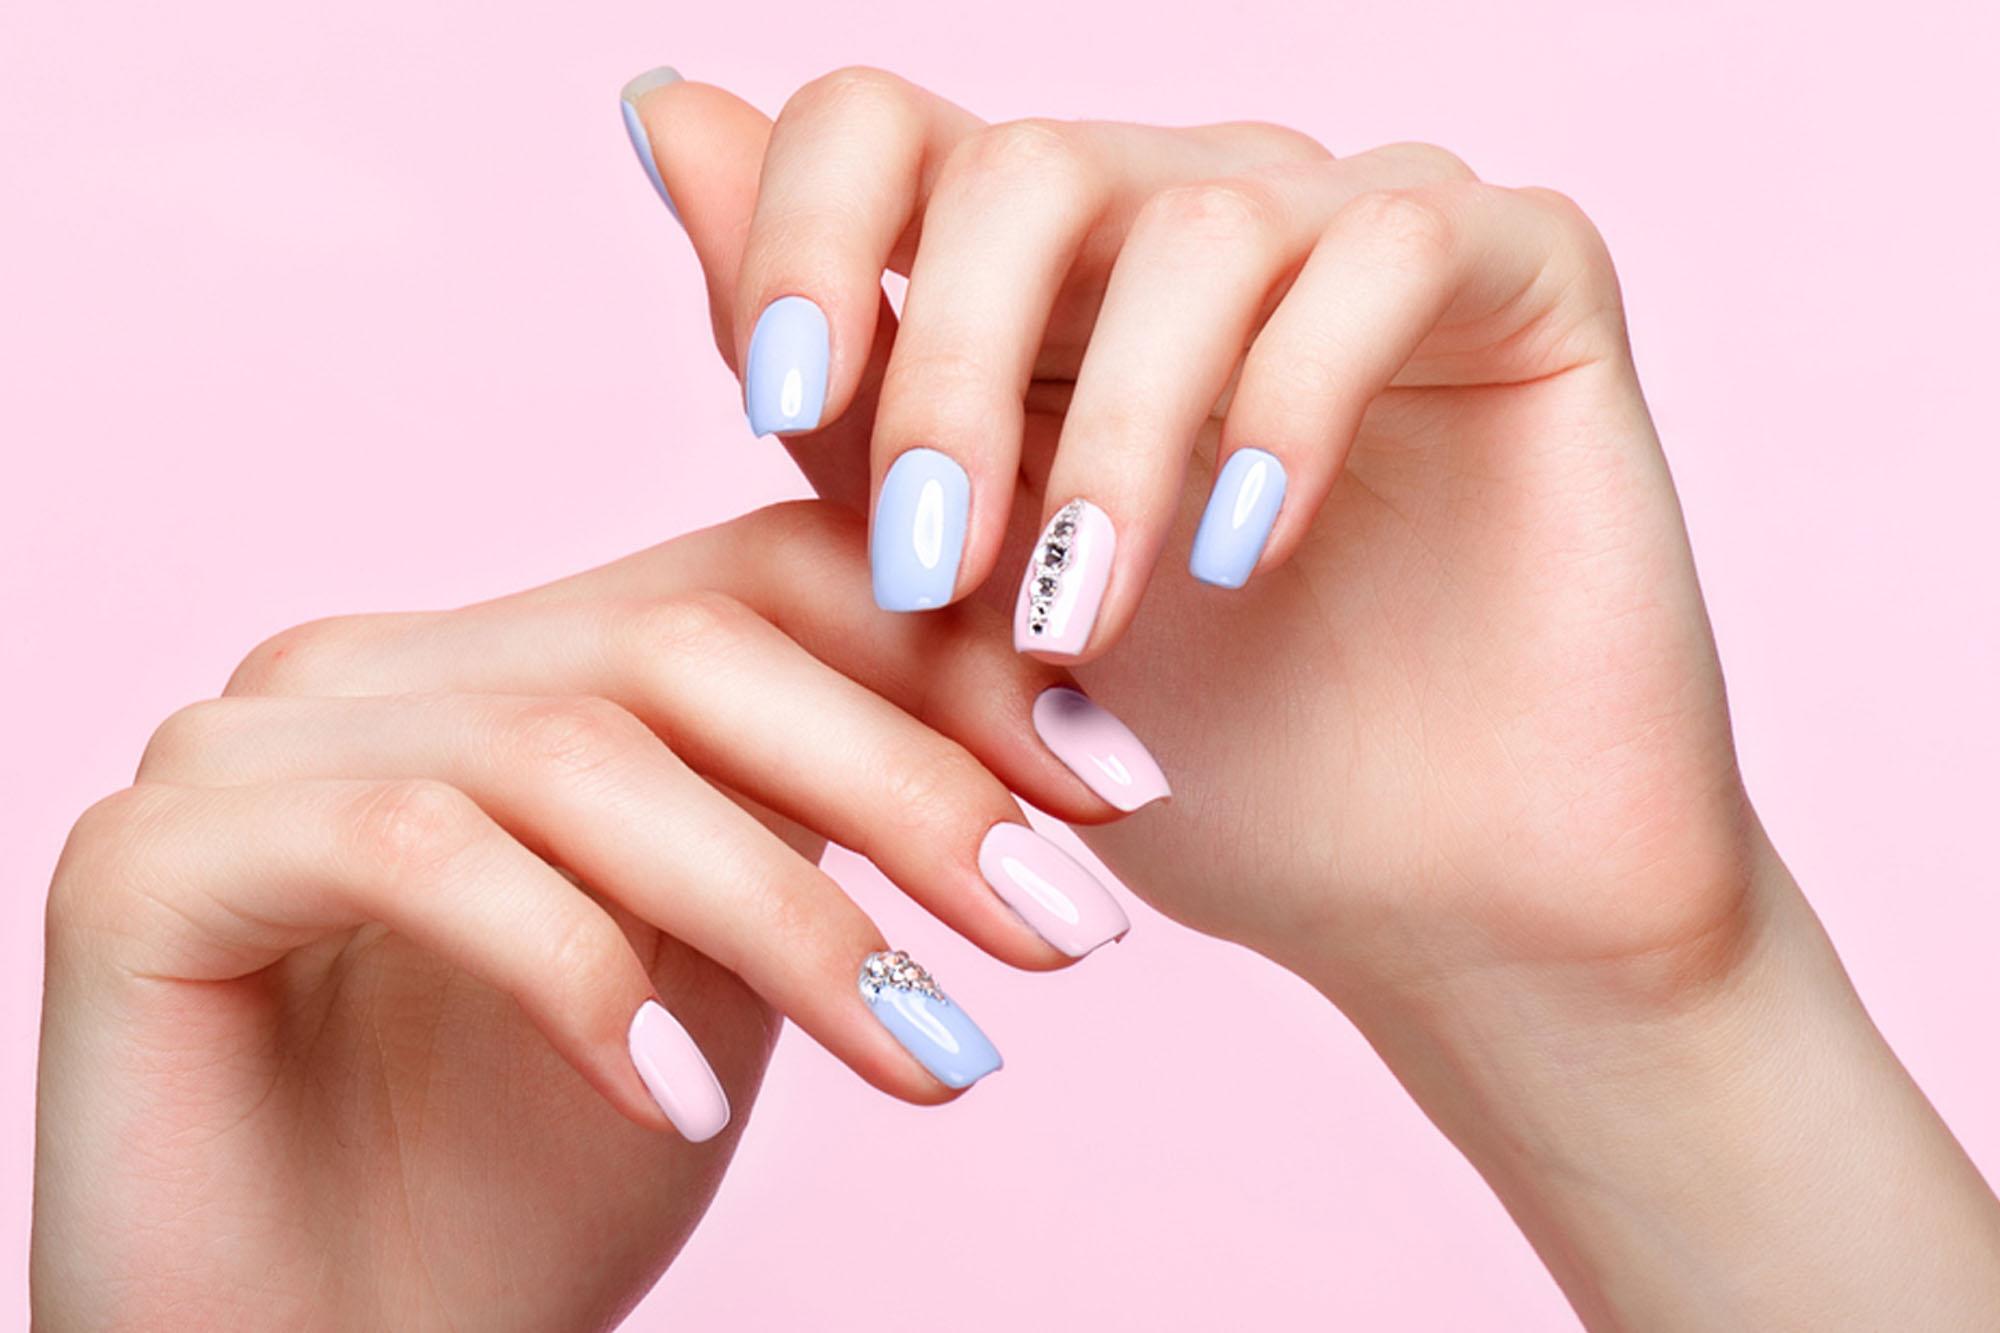 refill nails refil mani unghie piedi vercelli